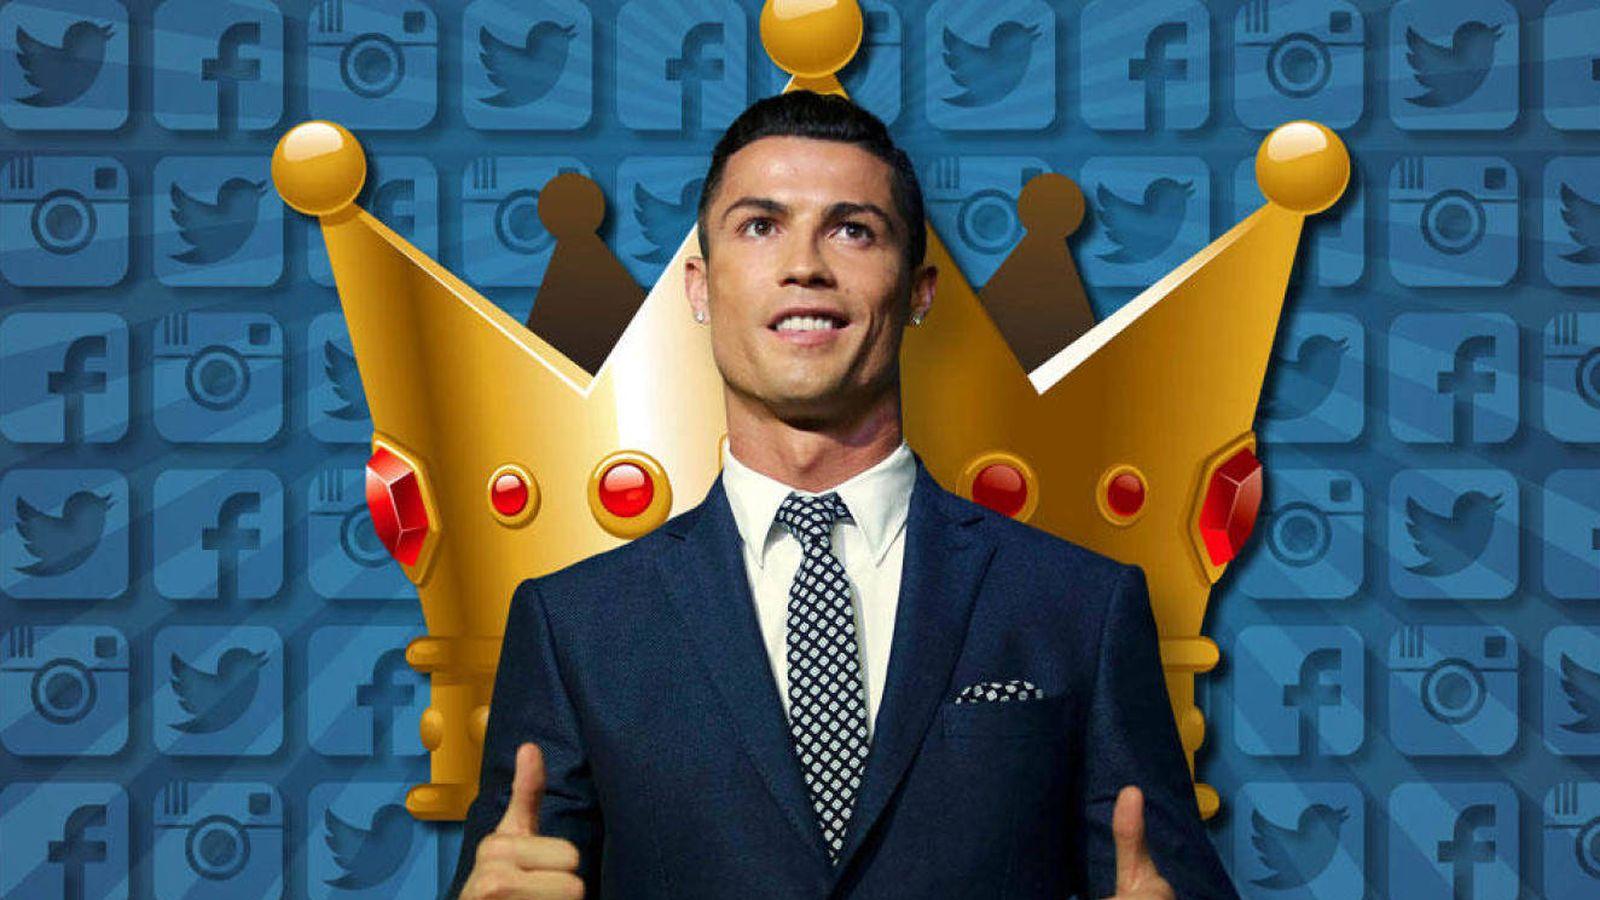 Foto: Cristiano Ronaldo en un fotomontaje realizado en Vanitatis.